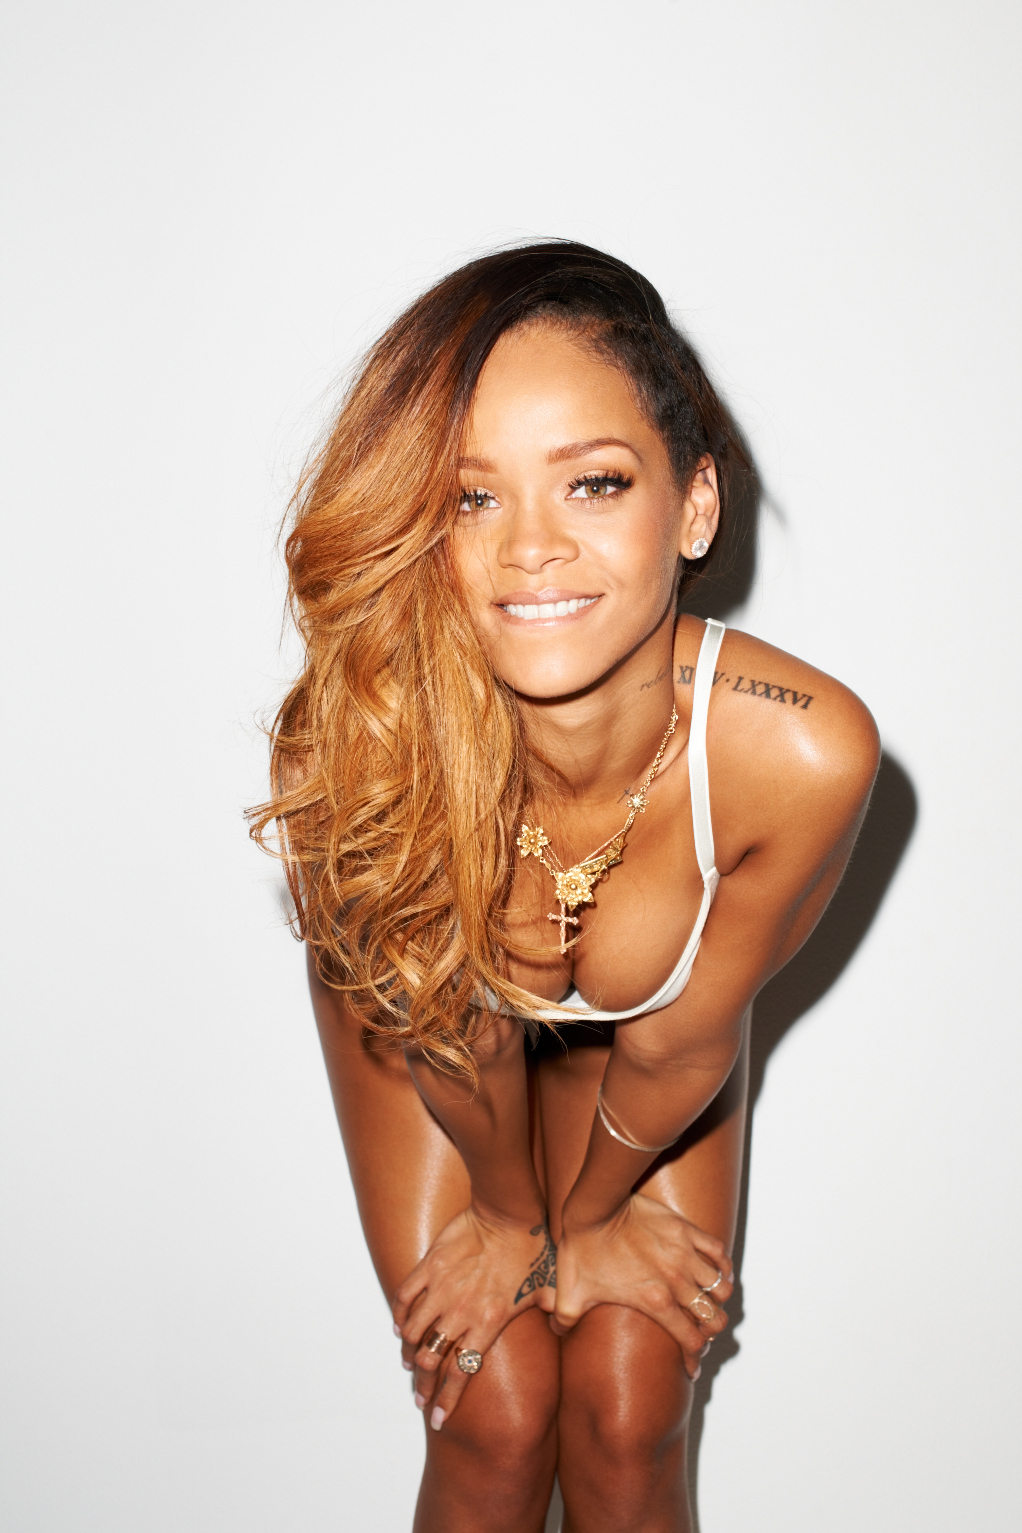 Rihanna - cc:by-sa - Fuente Wikipedia : Author: Ilikeriri